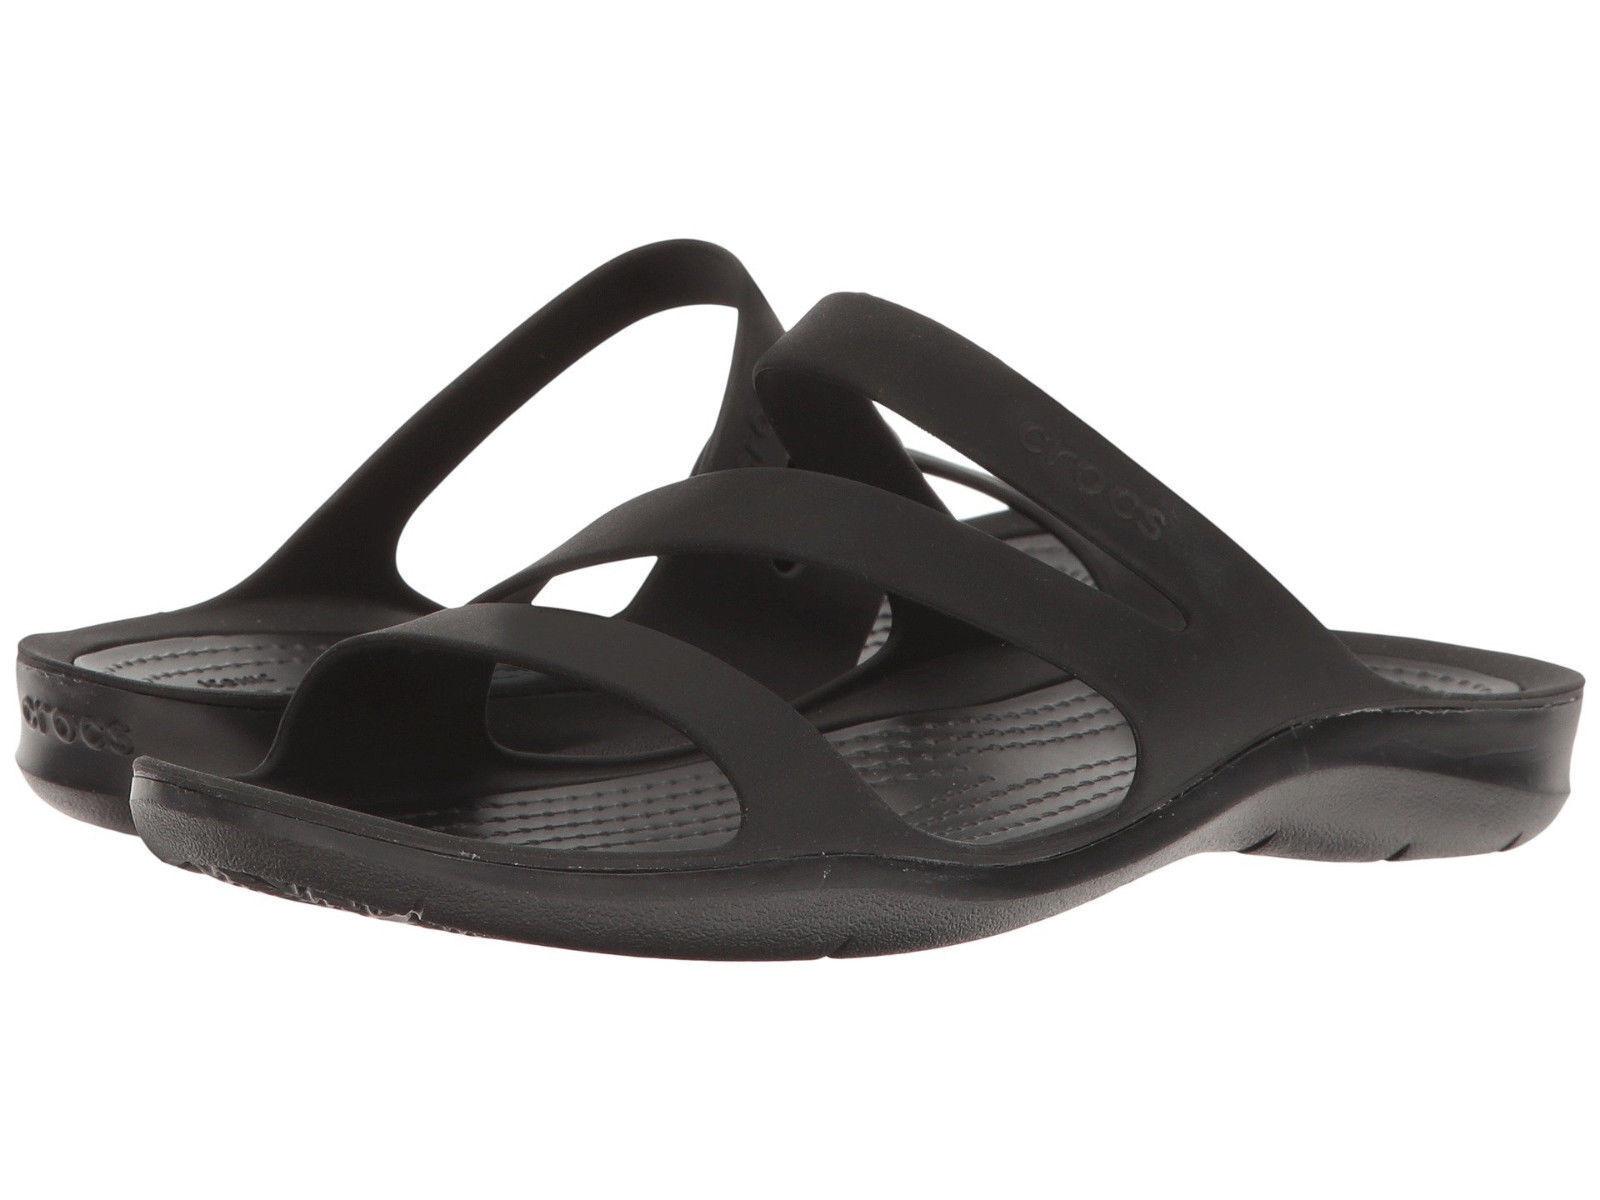 Women Crocs Swiftwater Sandal 203998-060 Black Black 100% Authentic Brand New